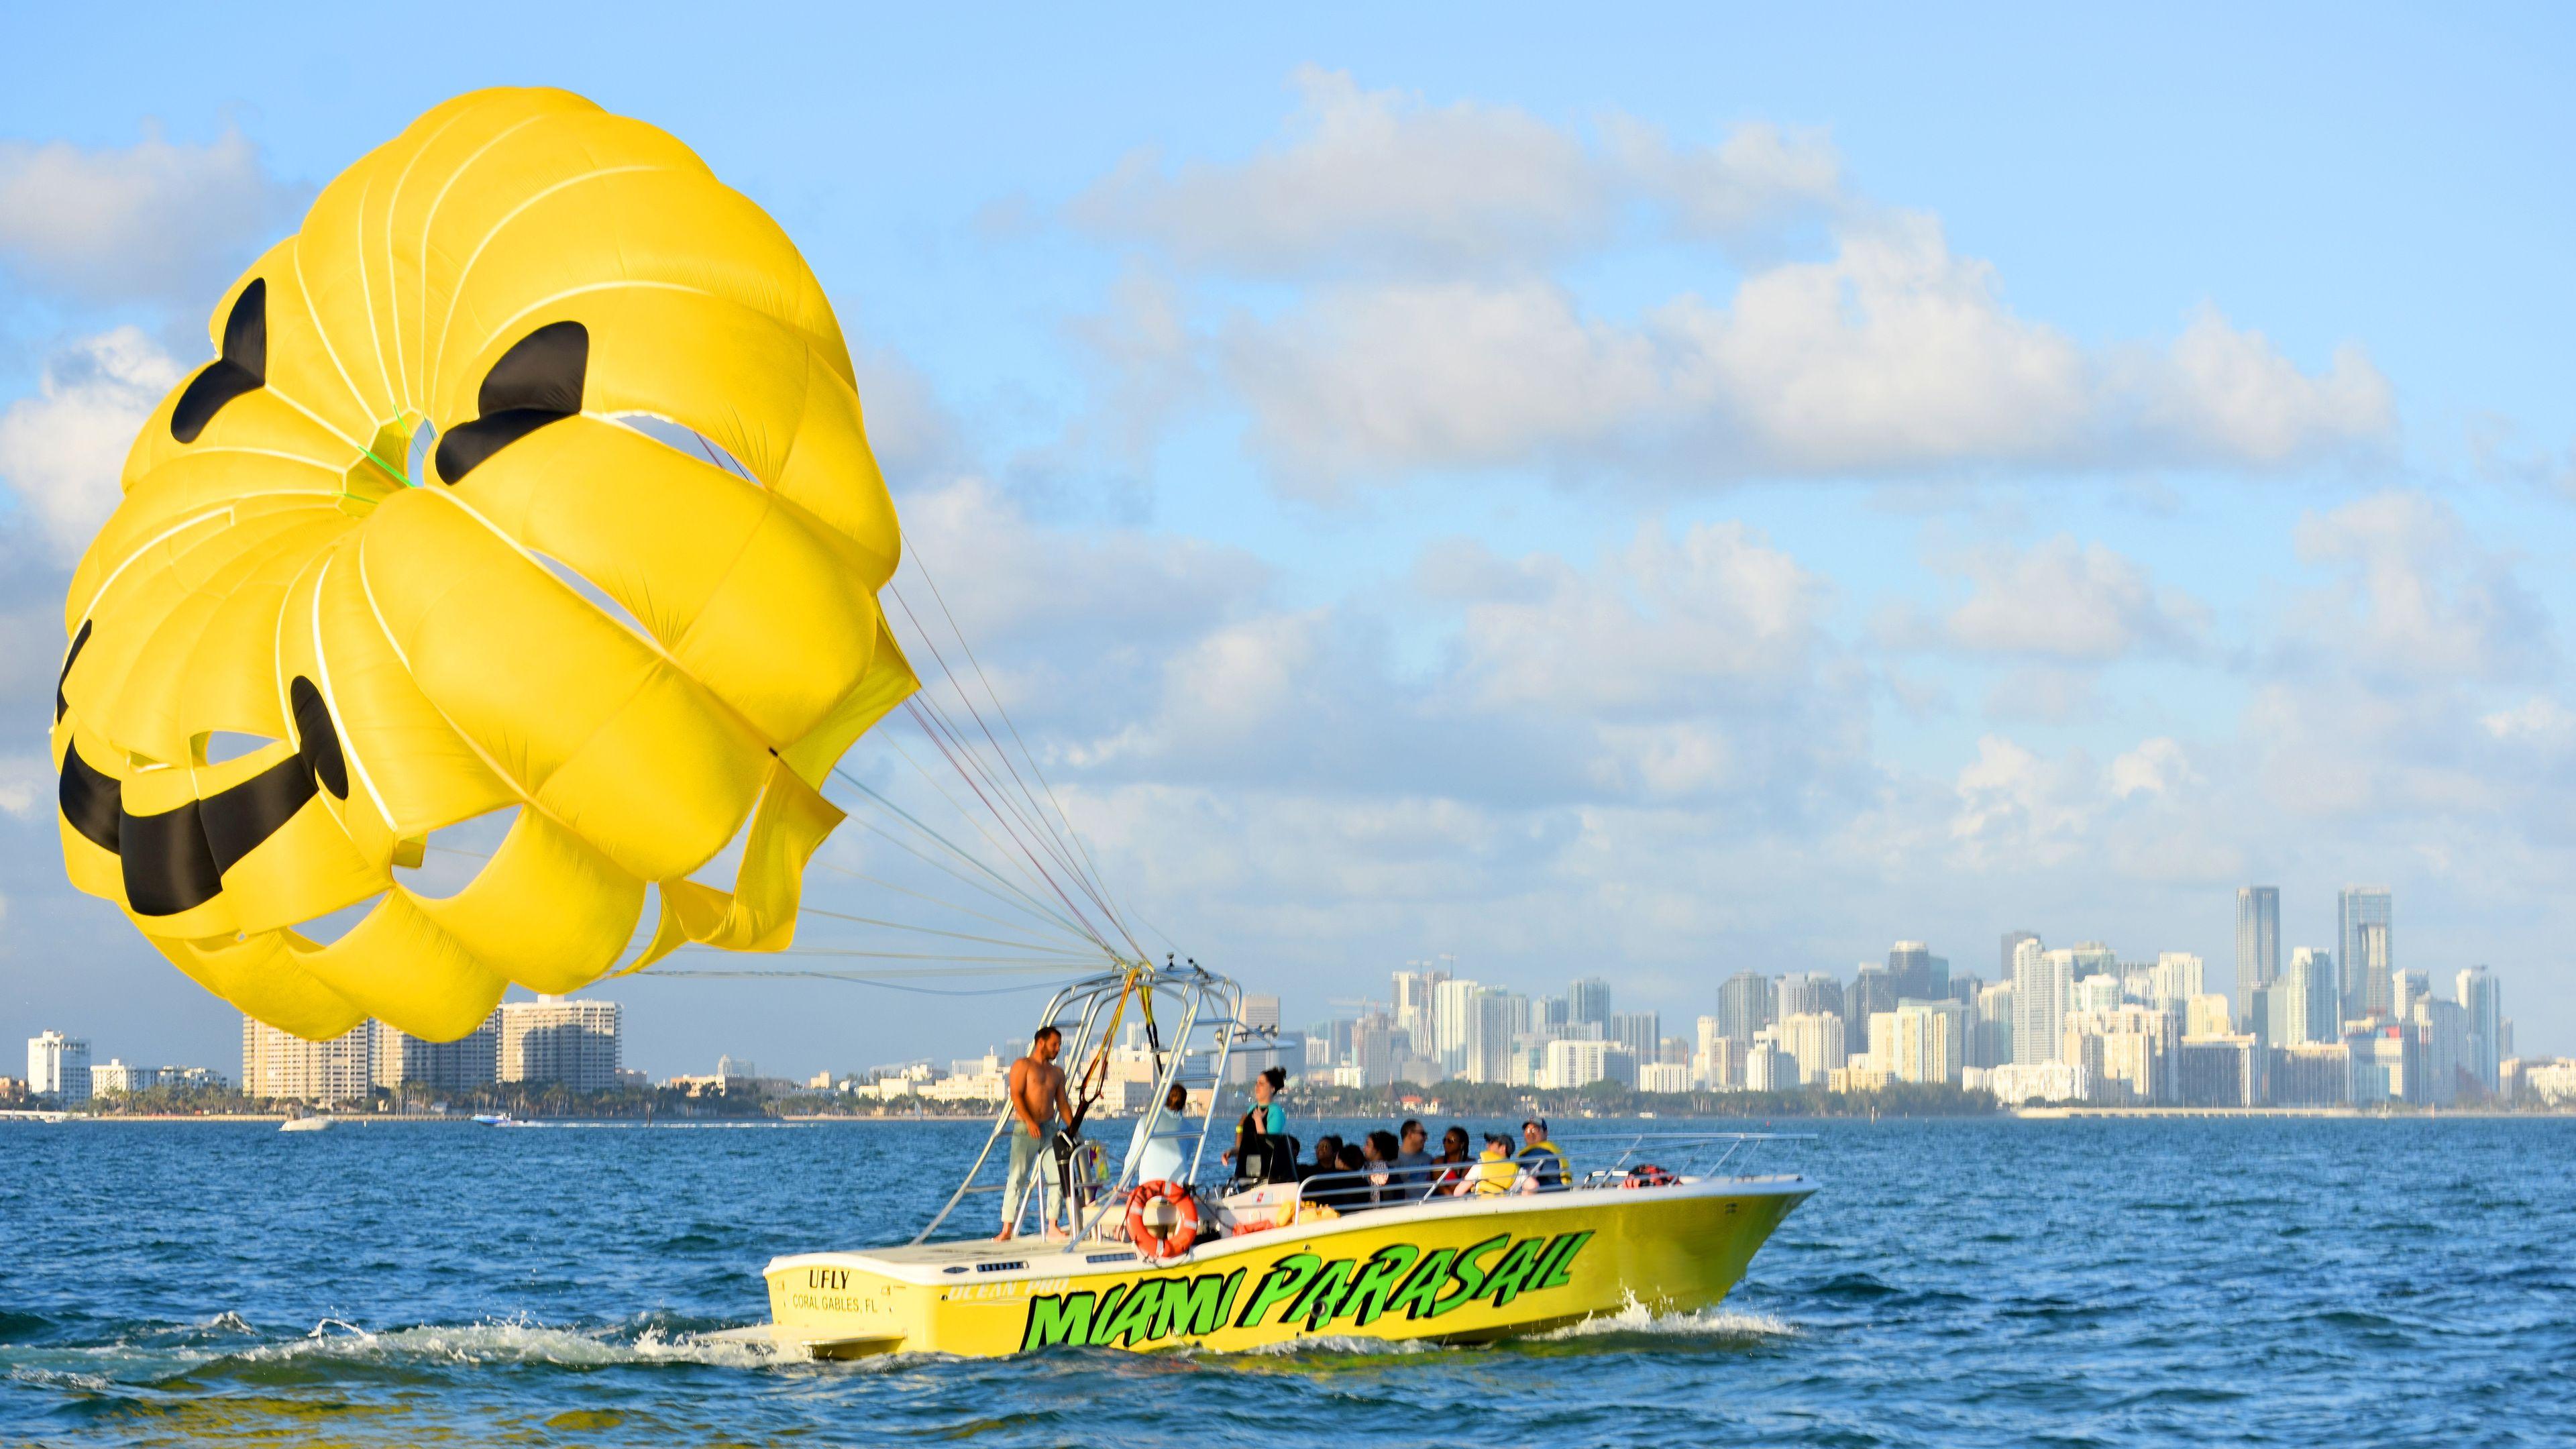 Parasailing boat dragging a happy face parachute